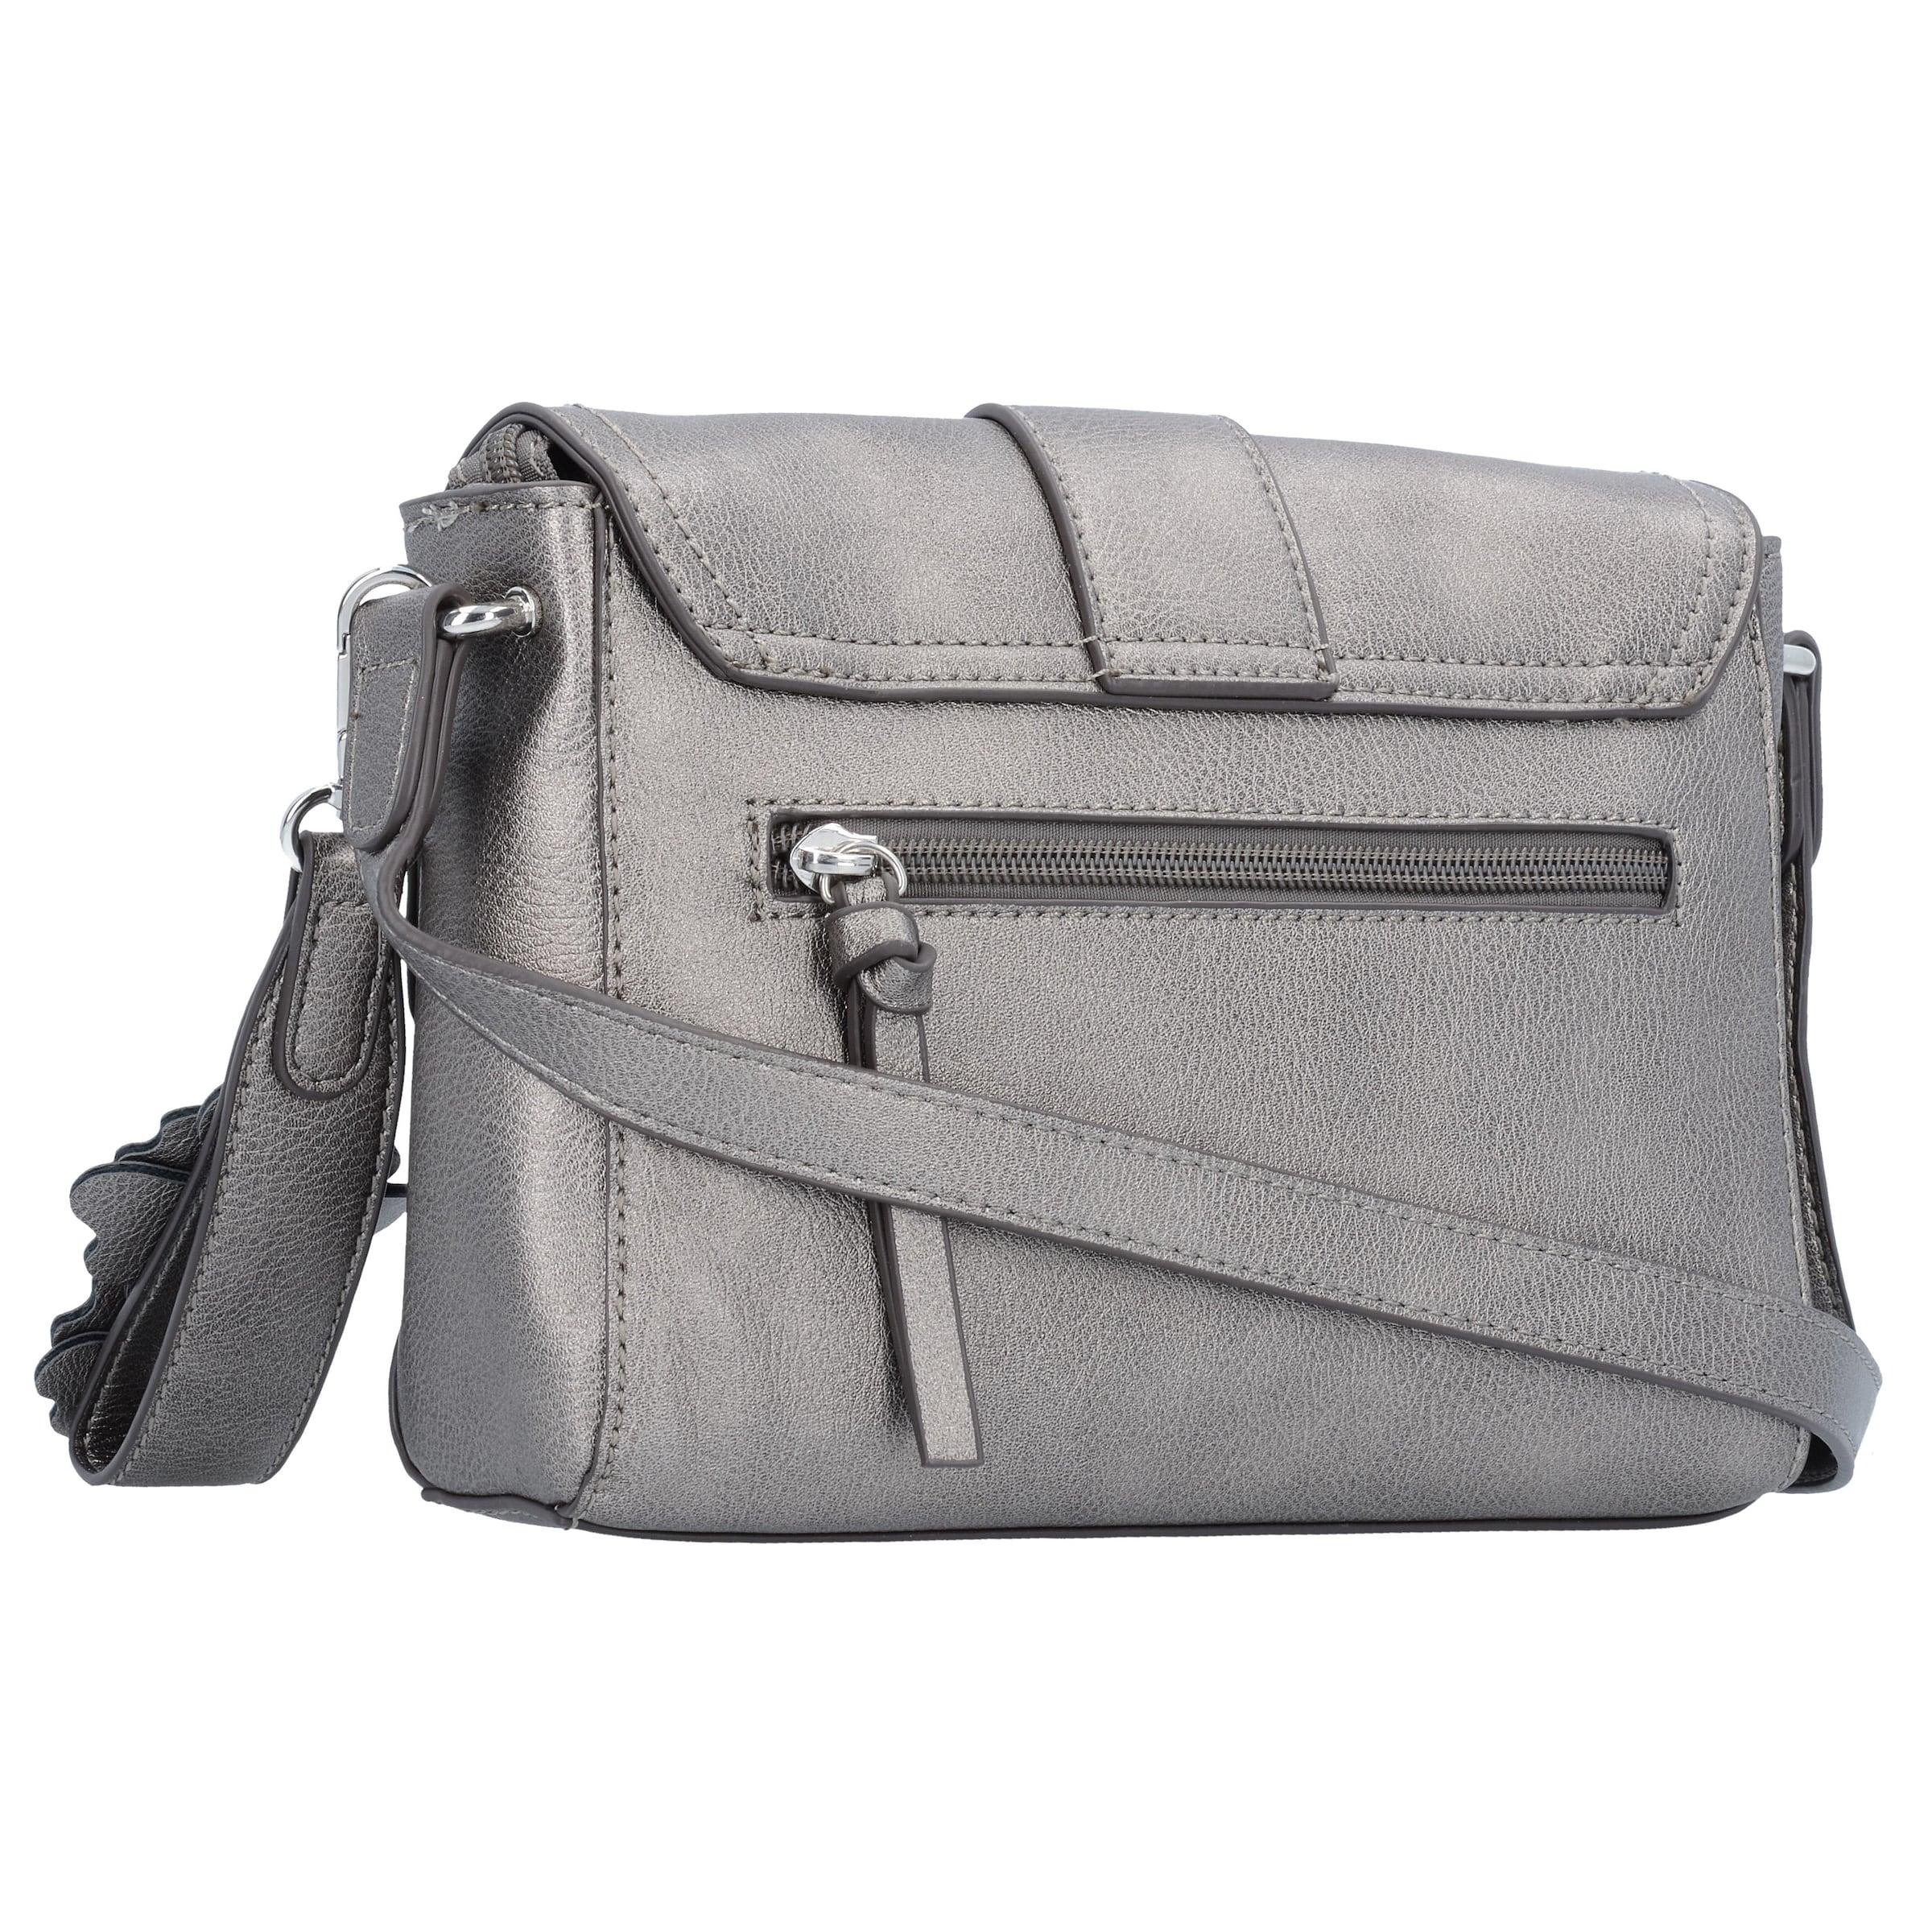 TAMARIS Danila Mini Bag Umhängetasche 22 cm Auslass Besuch Neu Shop Für Online Shop-Angebot Günstig Online Spielraum Shop-Angebot Classic Zum Verkauf rr6EwW